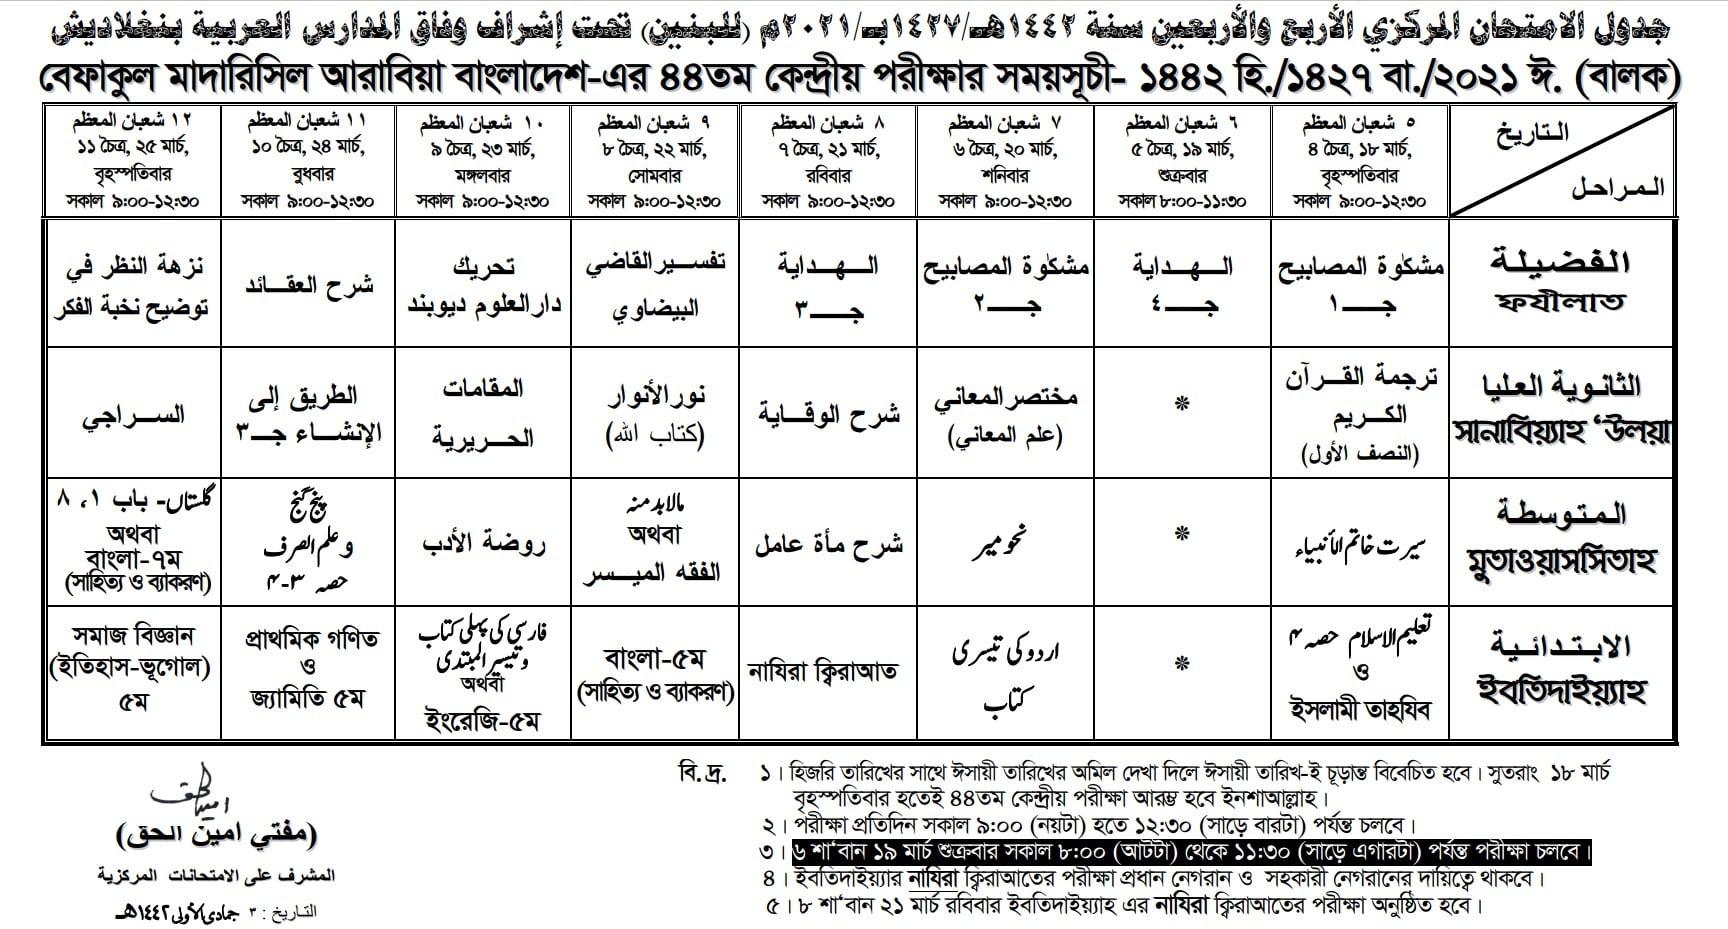 44th Befaq Routine 2021 | ৪৪ তম বেফাক পরীক্ষার রুটিন ২০২১ পুরুষ বিভাগ